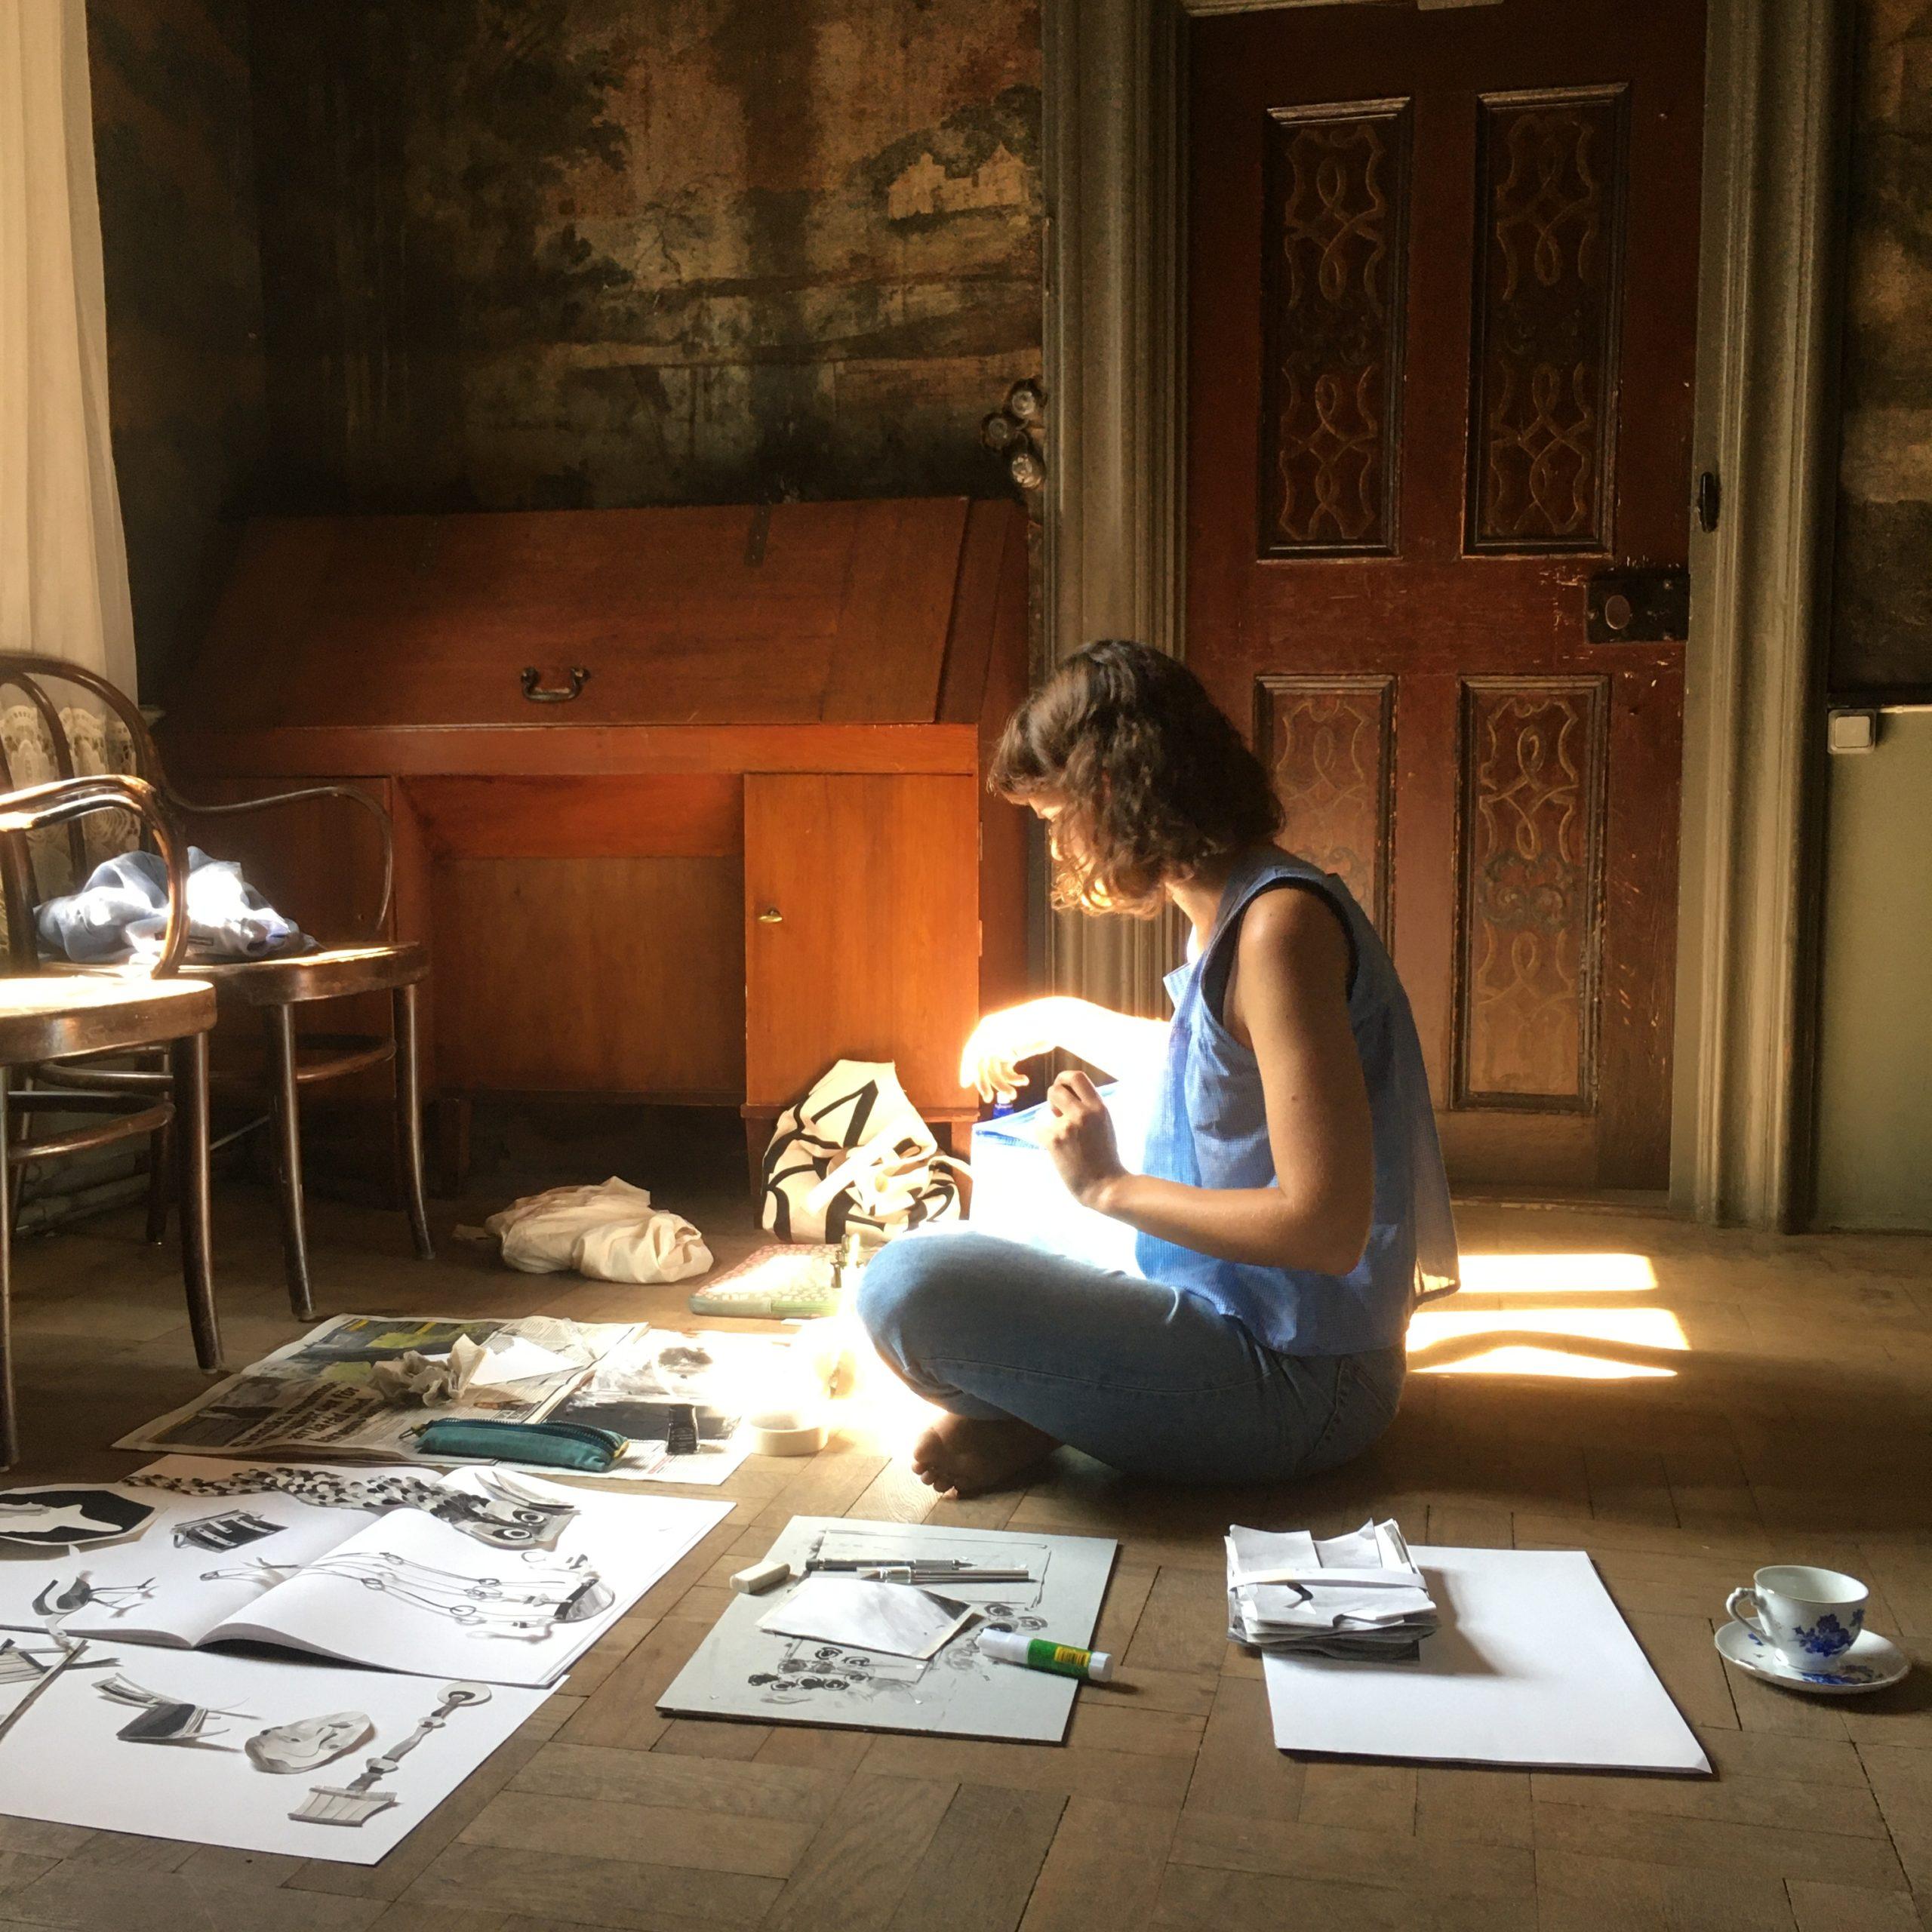 Artist Catherine Paterson working in a room at Gathenhielmska Huset.